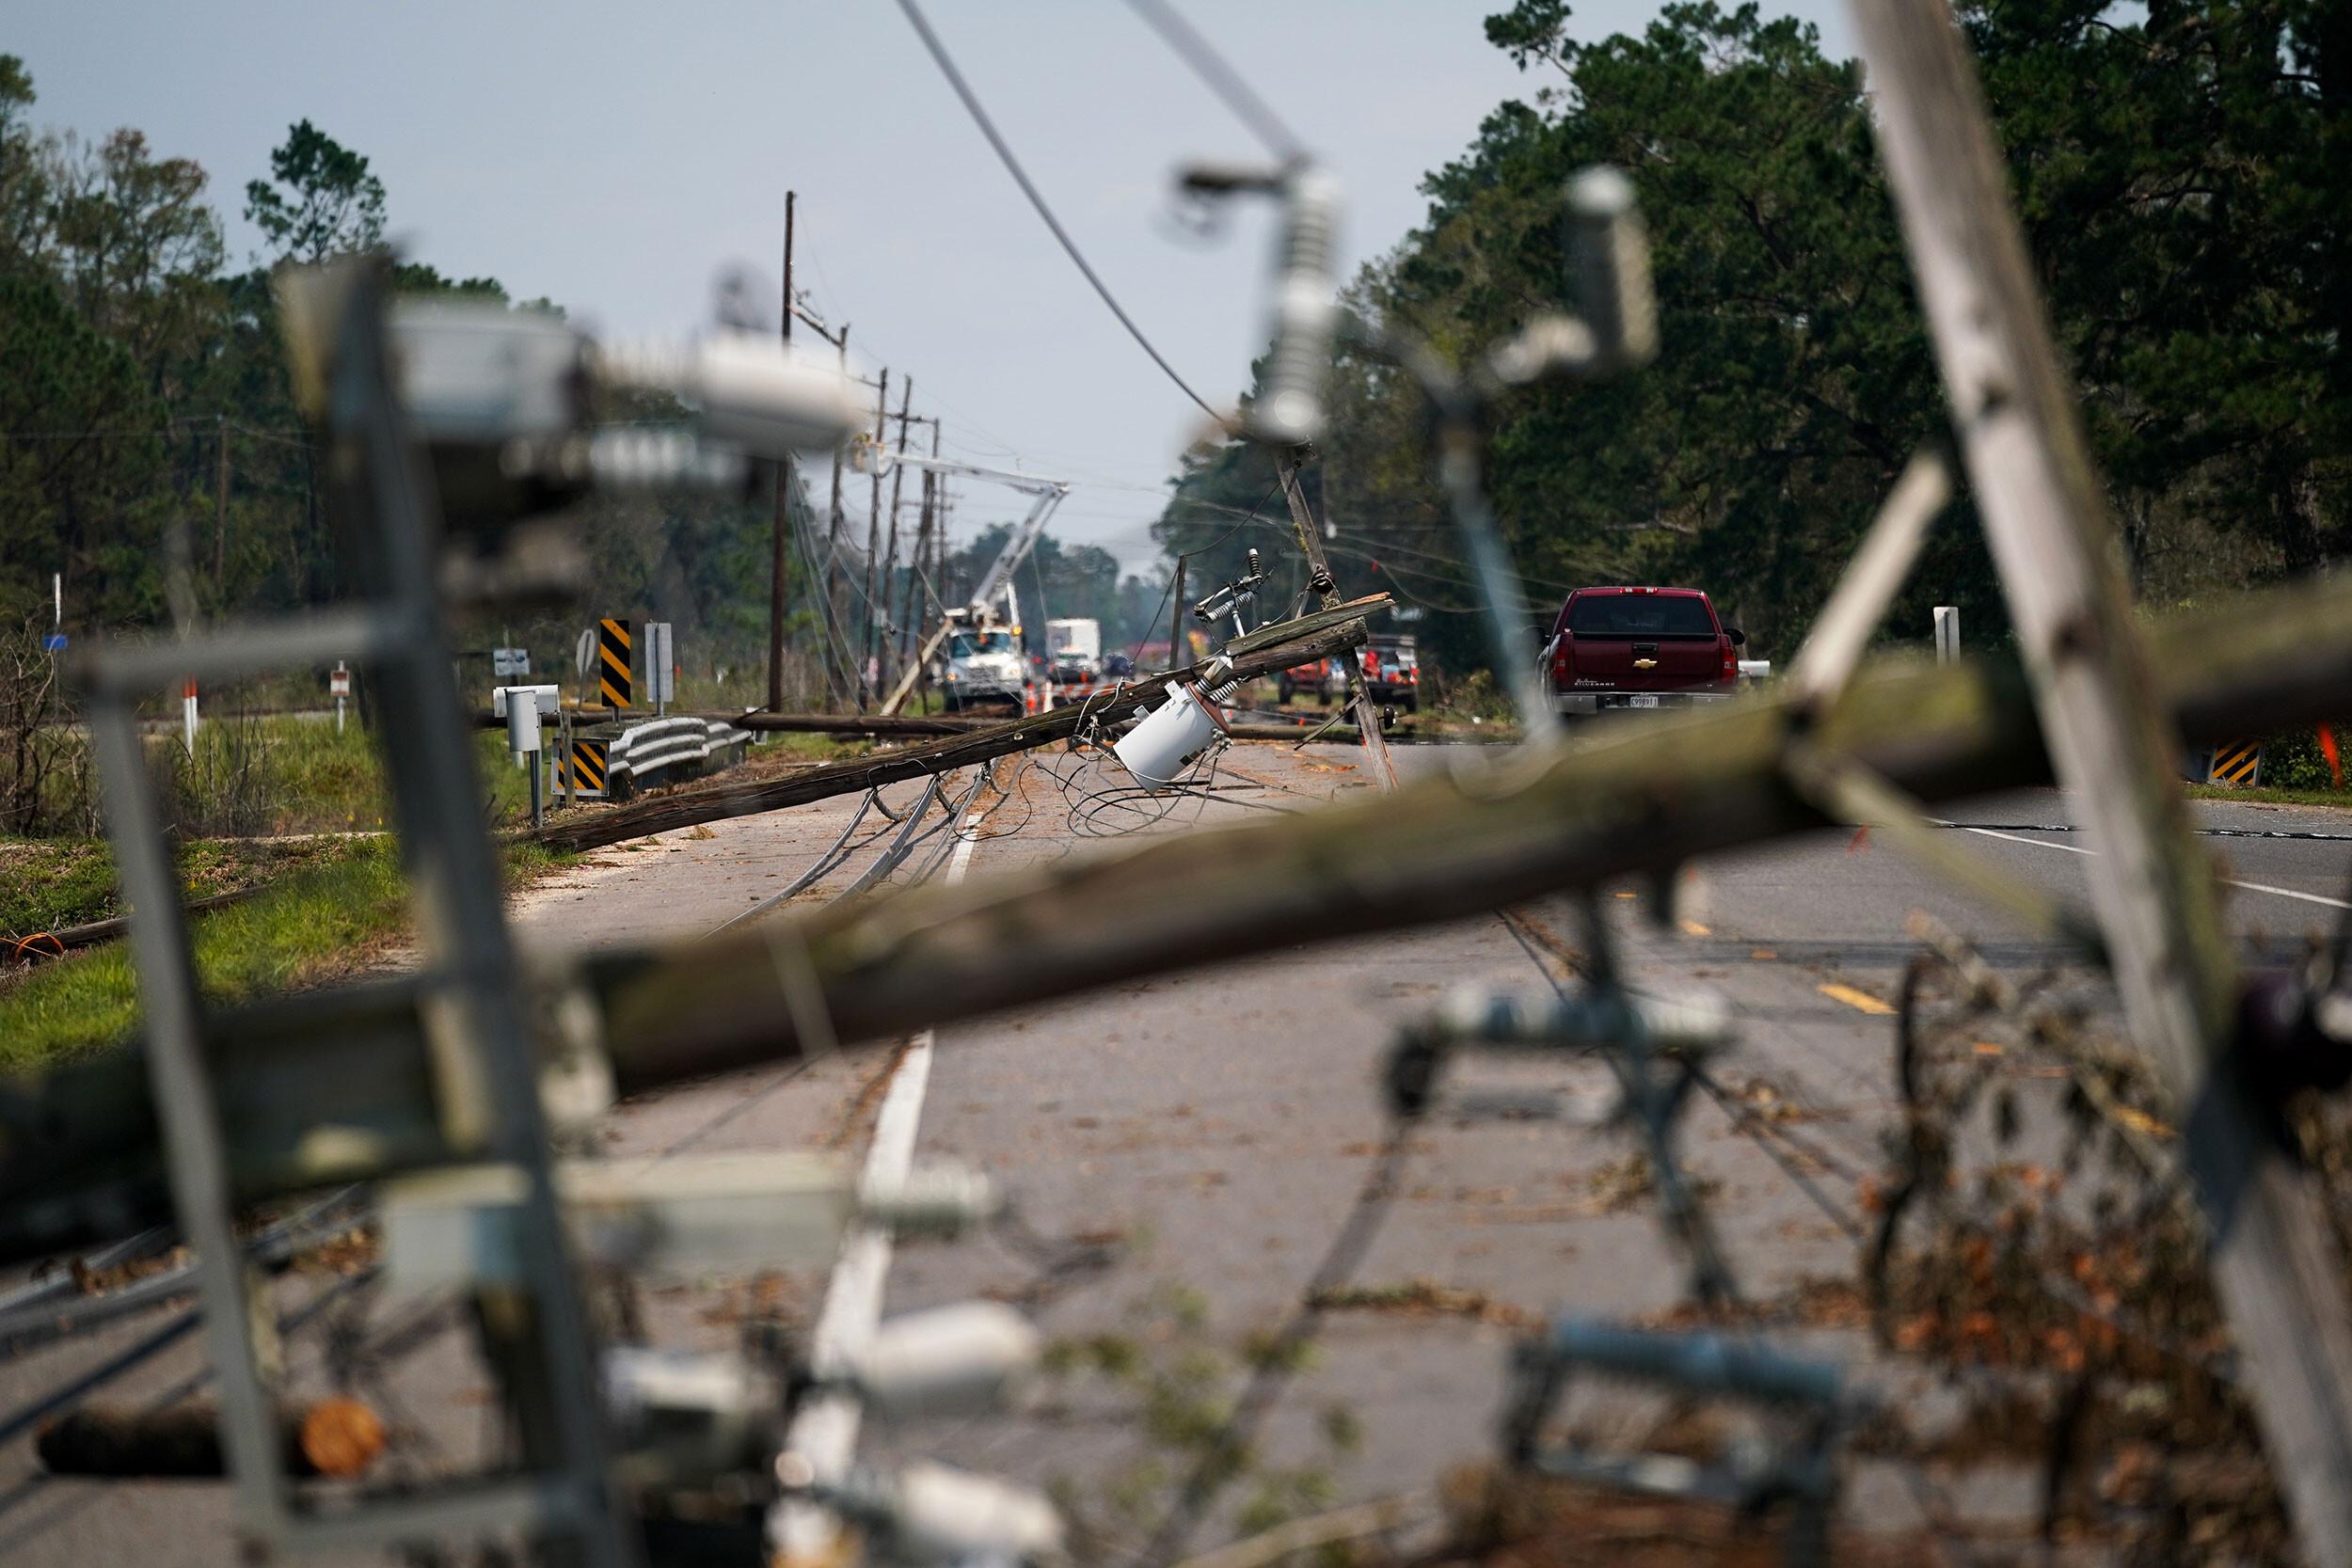 Hurricane Ida took down more power poles in 2 states than Katrina, Ike, Delta and Zeta combined, power company says